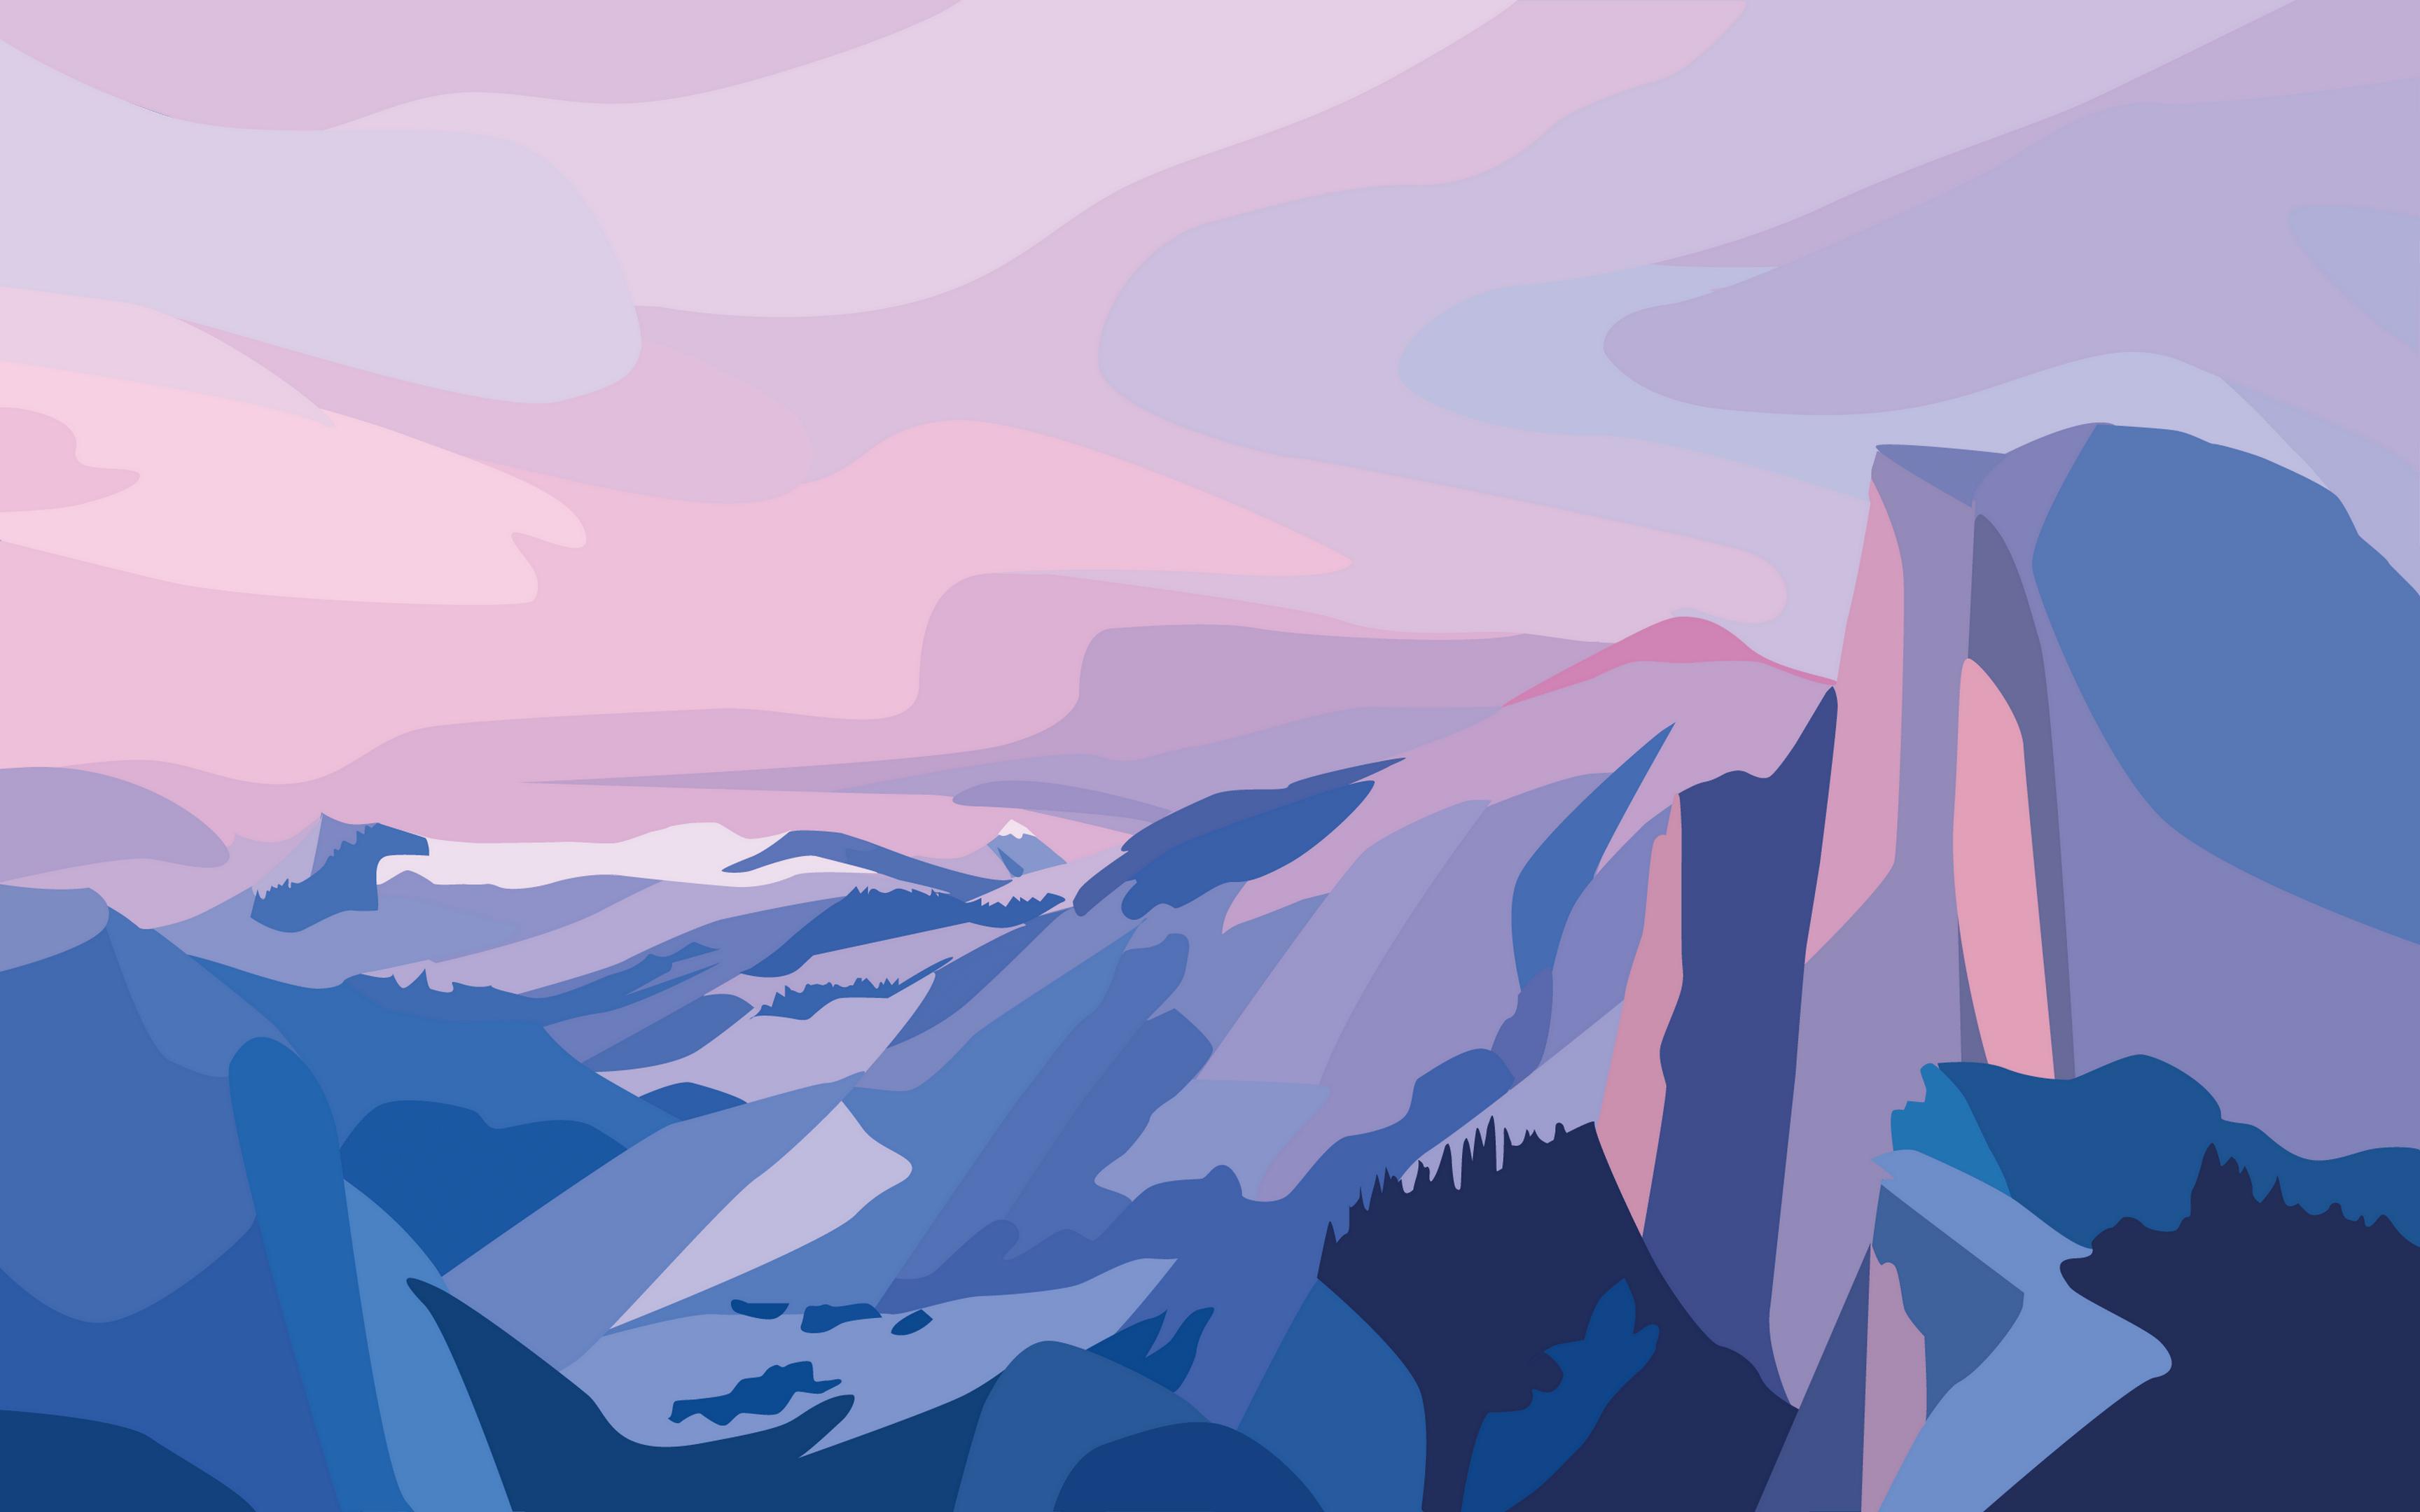 Pastel Blue Aesthetic Desktop Wallpapers - Top Free Pastel ...